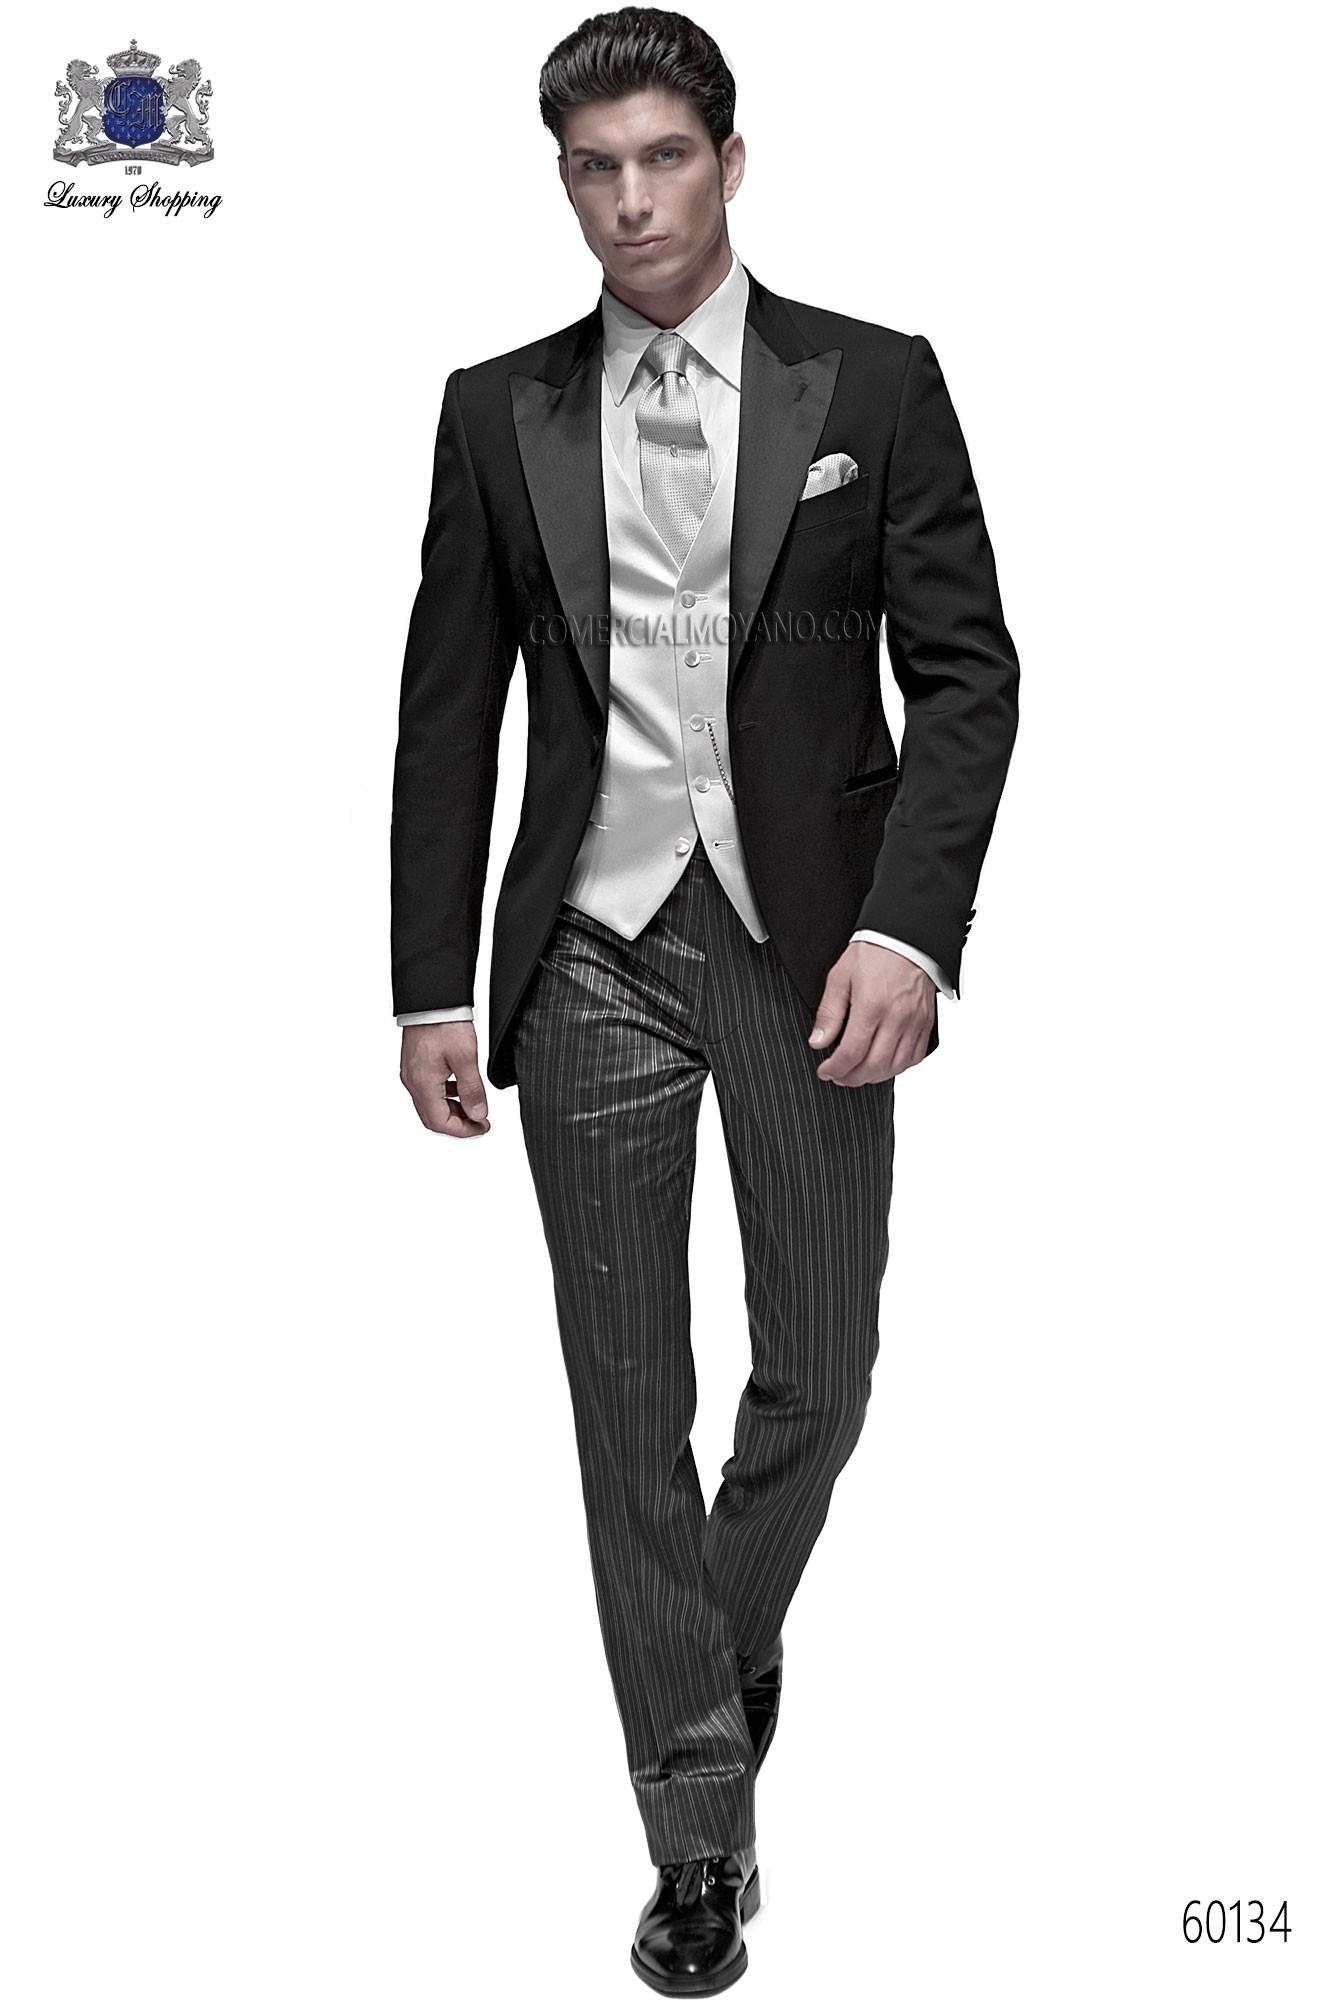 Traje de novio italiano a medida, chaqueta negra en tejido lana mixto acetato con solapa pico y 1 boton; coordinado con pantalon a rayas, modelo 60134 Ottavio Nuccio Gala colección Fashion.